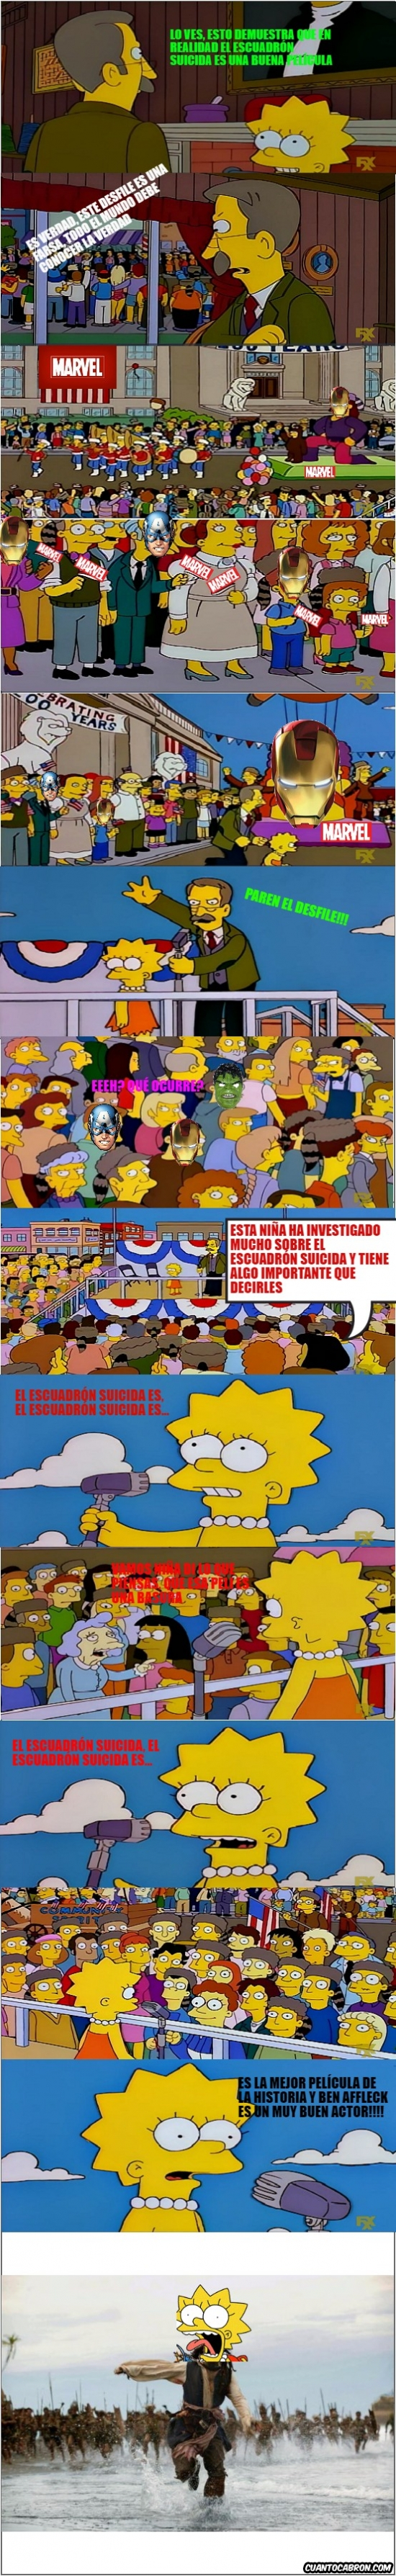 Meme_otros - Lisa posee la verdad absoluta